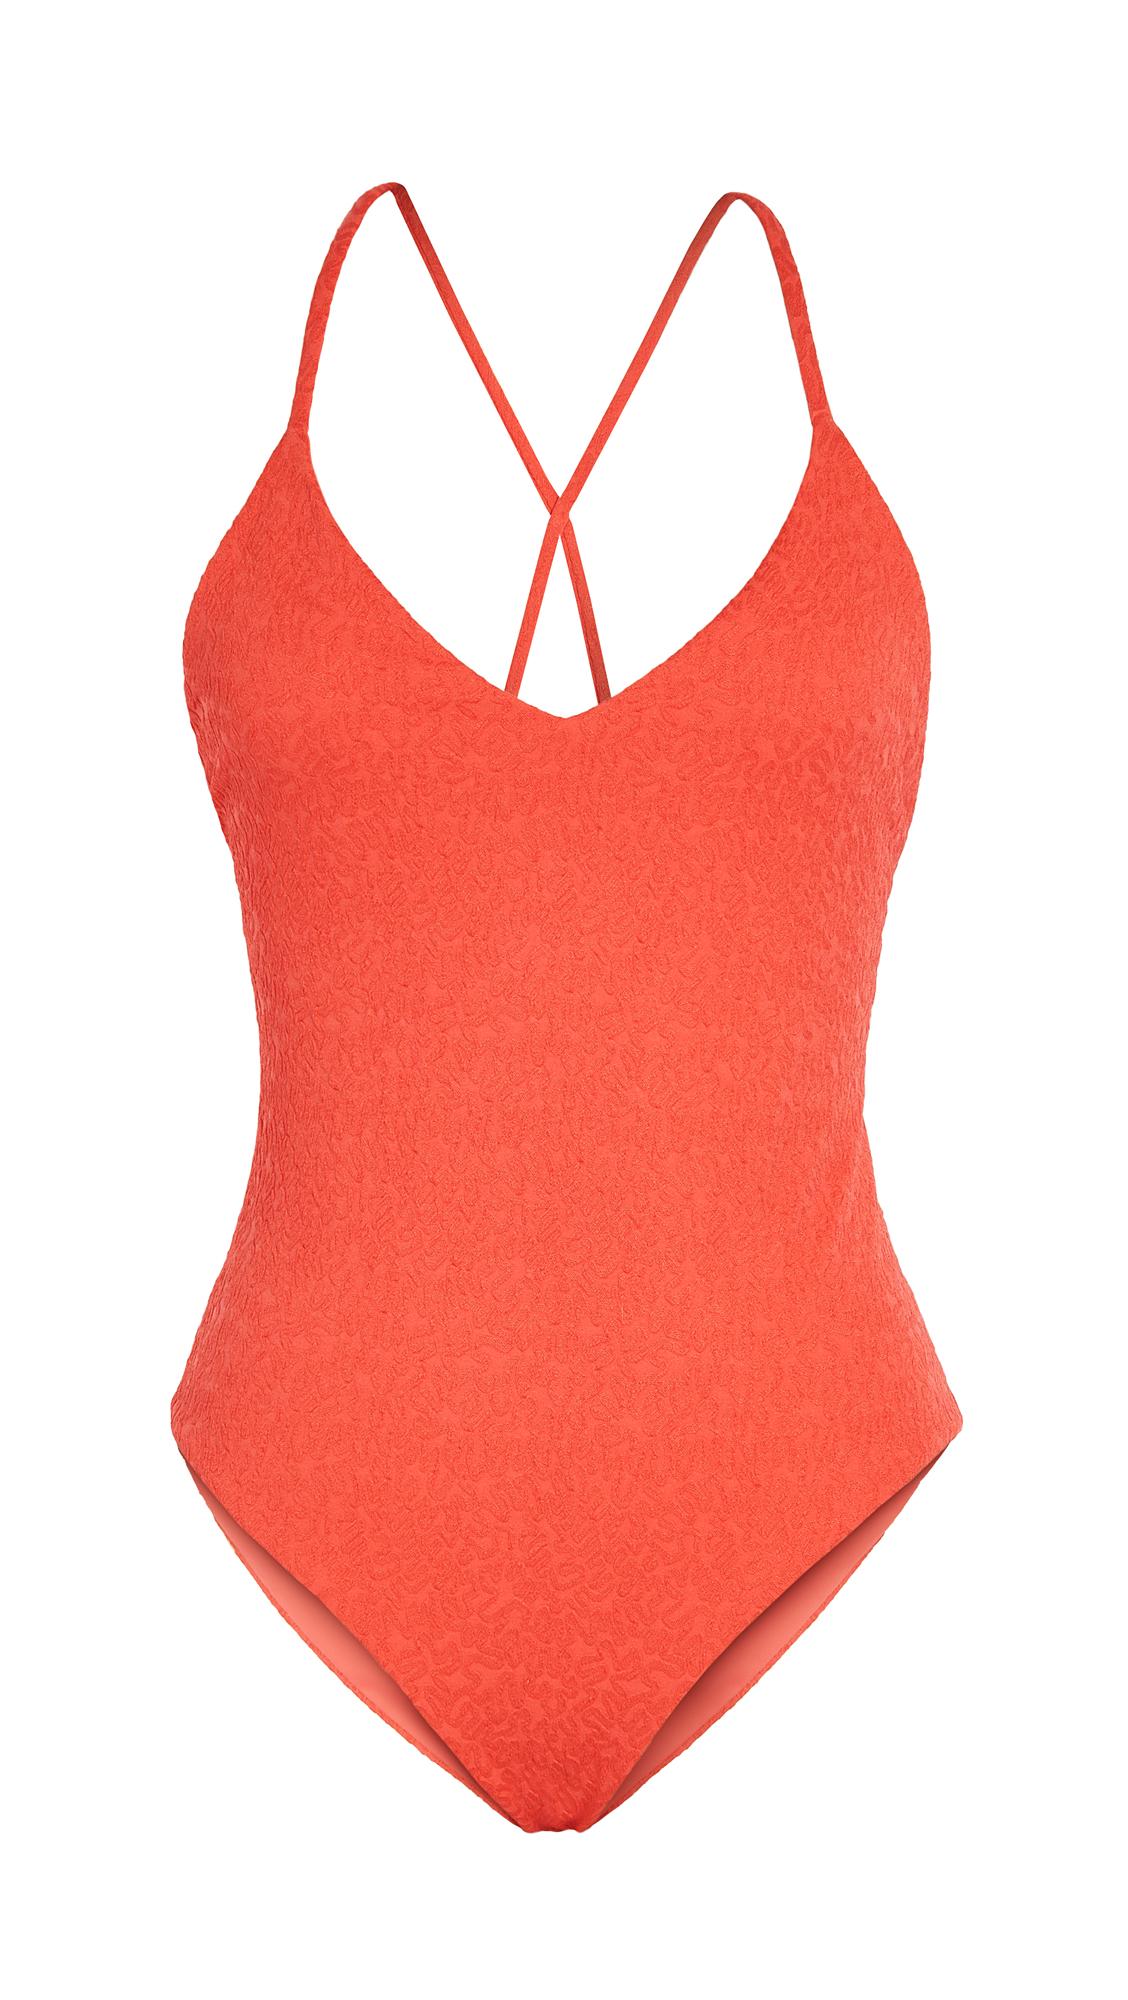 Mara Hoffman Emma One-piece Swimsuit In Red